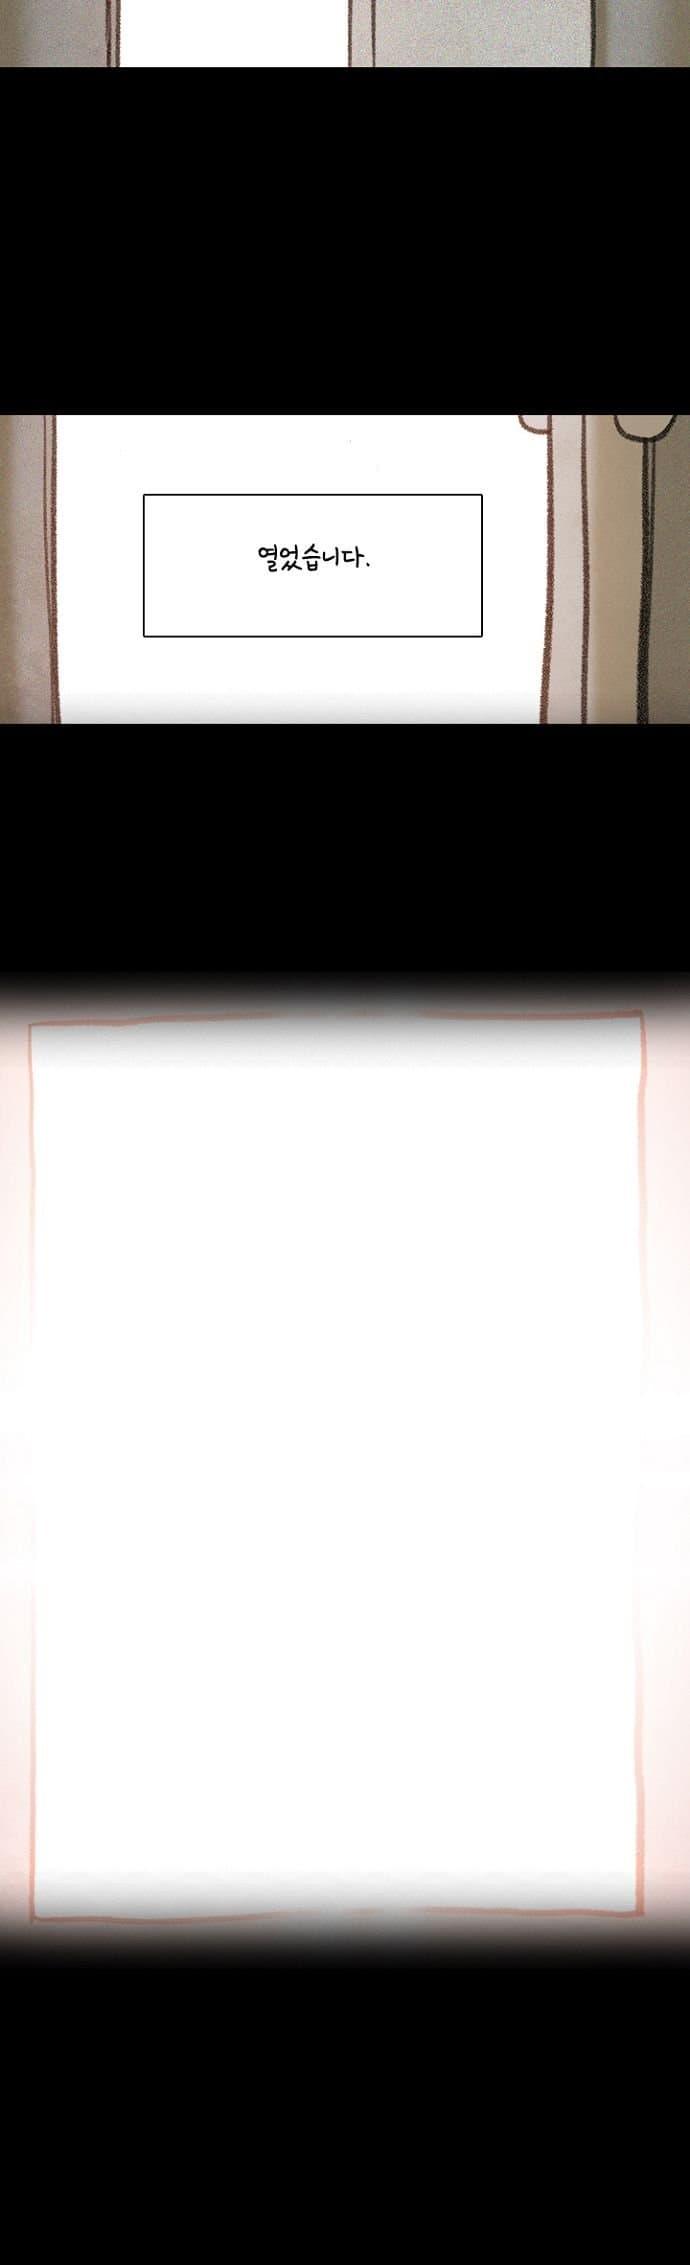 viewimage.php?id=2ebcc232eadd36&no=24b0d769e1d32ca73feb87fa11d0283175f95a5bb5a9434fdc24c2adb3494bdaab2e293cc17326bcc56f63251e746bba792355c746db08ac2826e91662b62bc8448a50